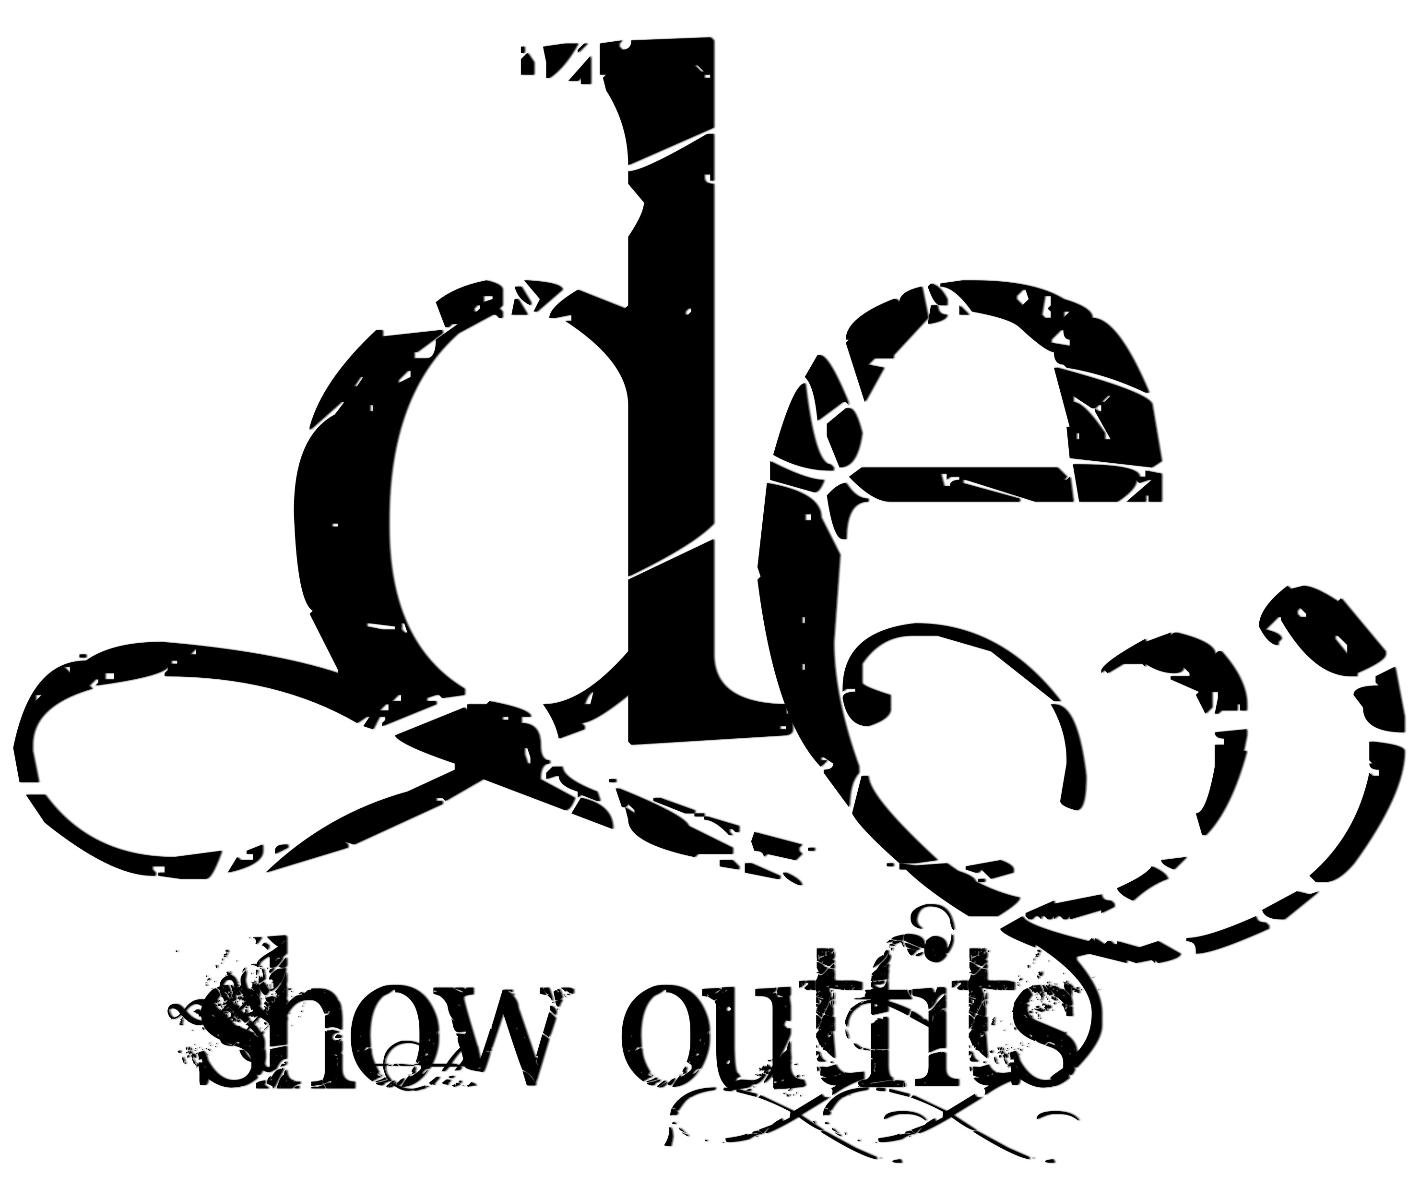 http://de-showoutfits.at